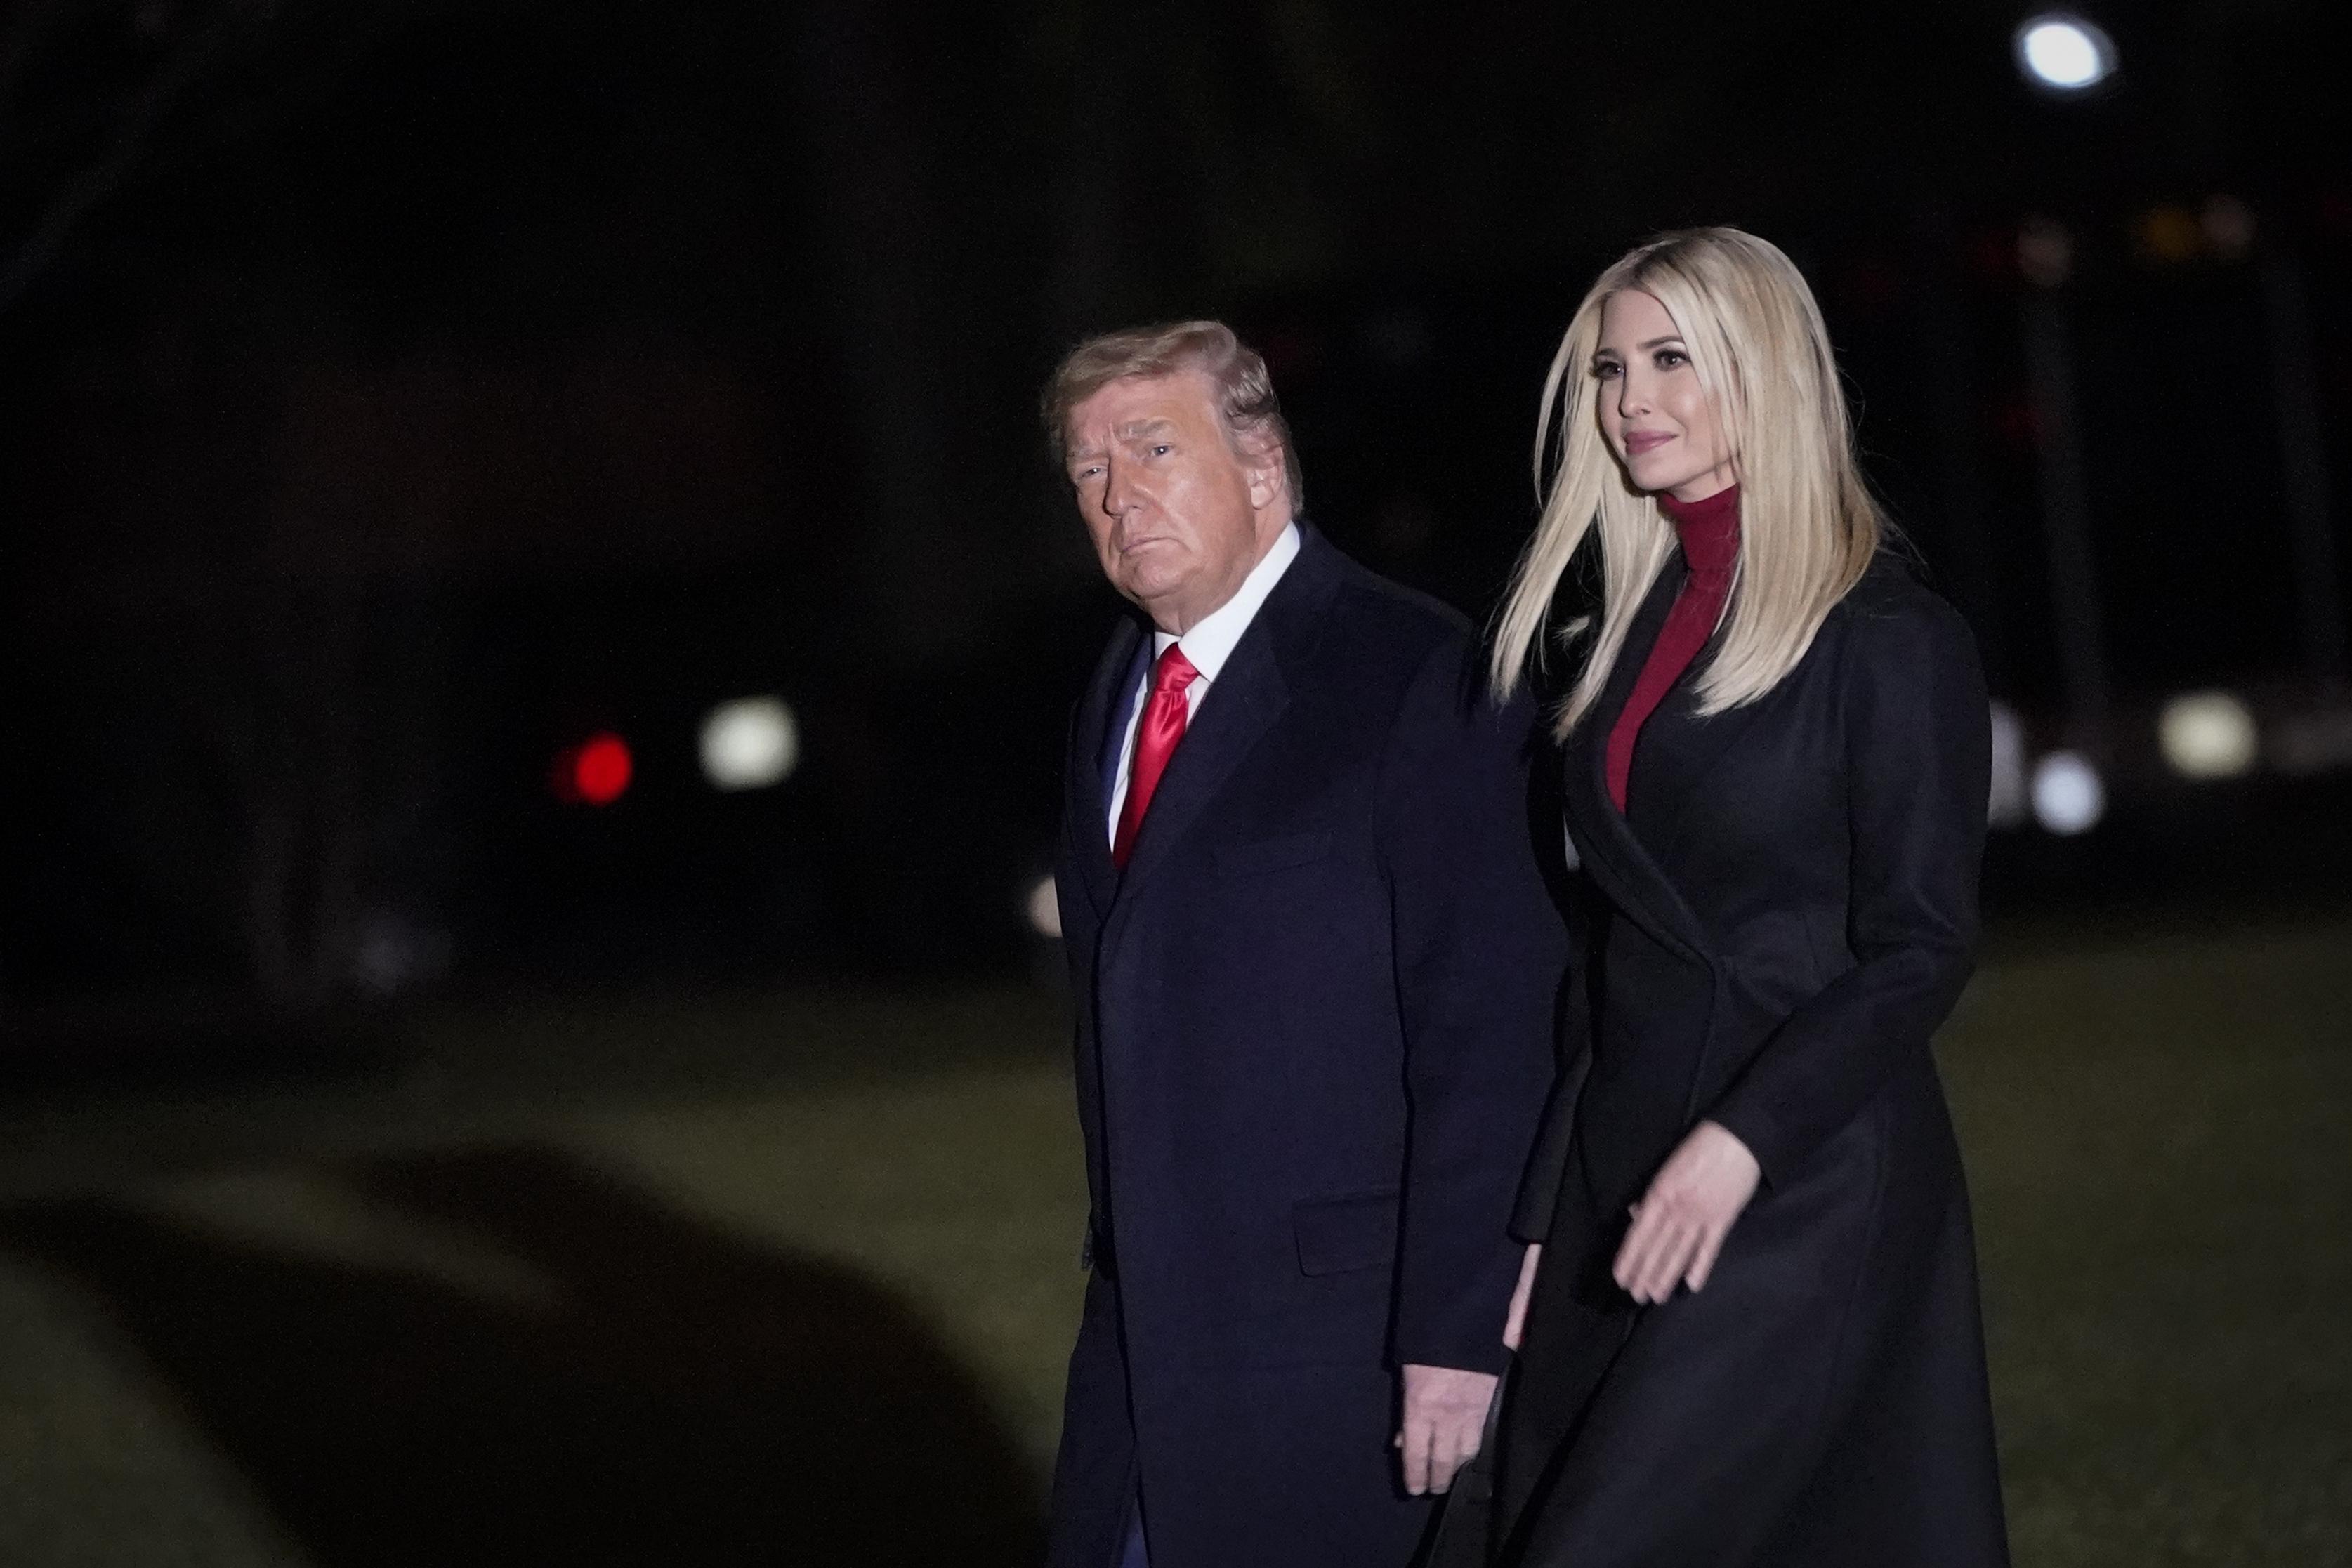 Vivica Fox Accuses Ivanka Trump of Racist Insult on 'Celebrity Apprentice'